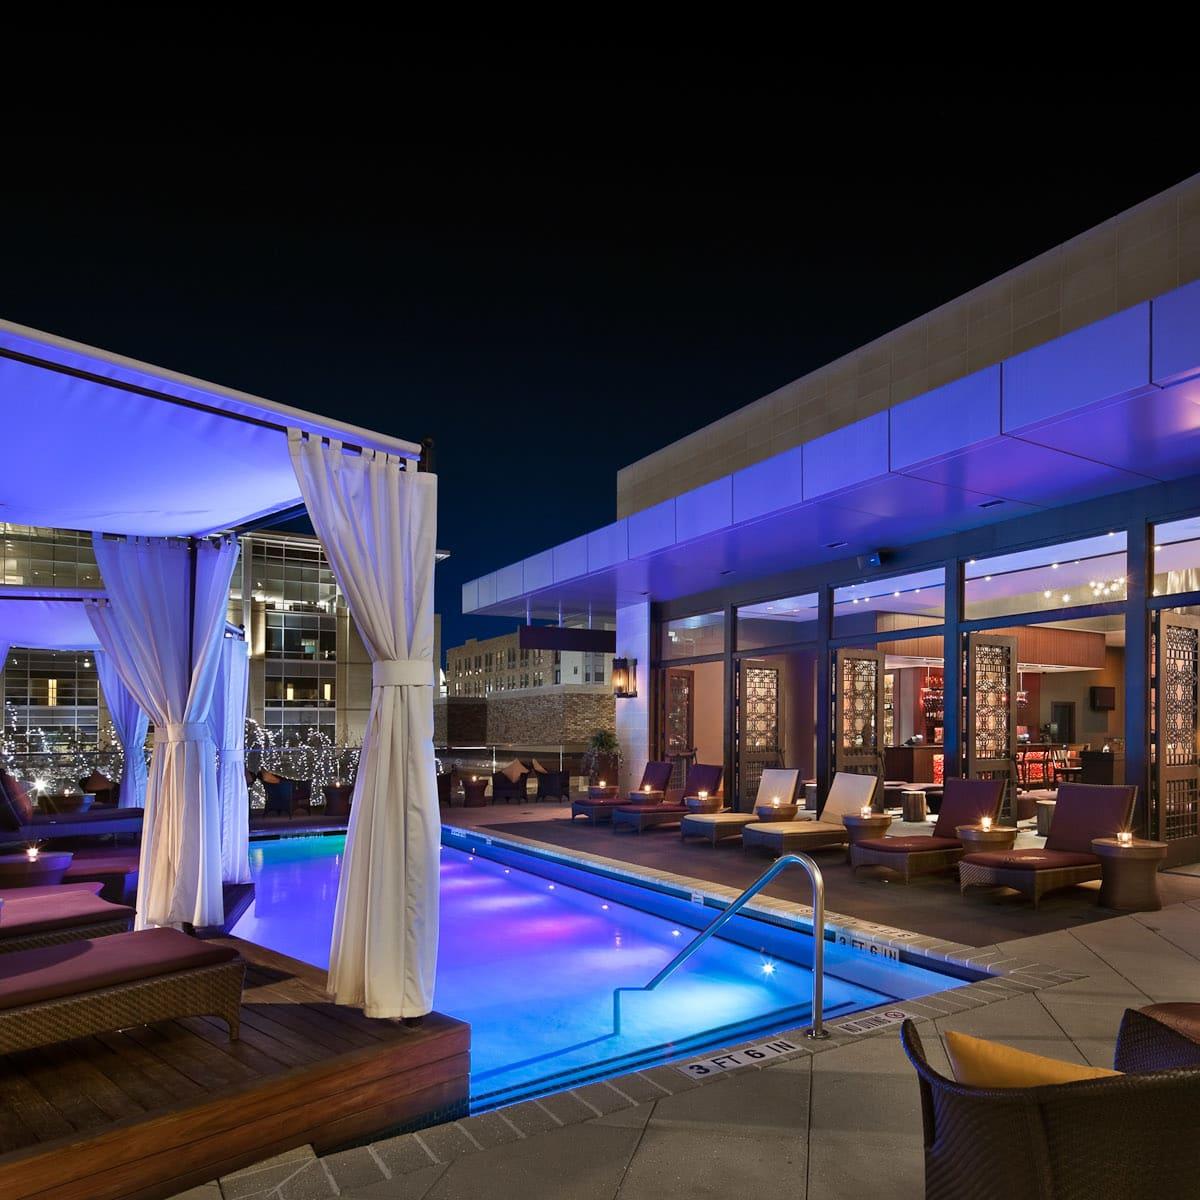 News_Hotel Sorella_Monnalisa bar